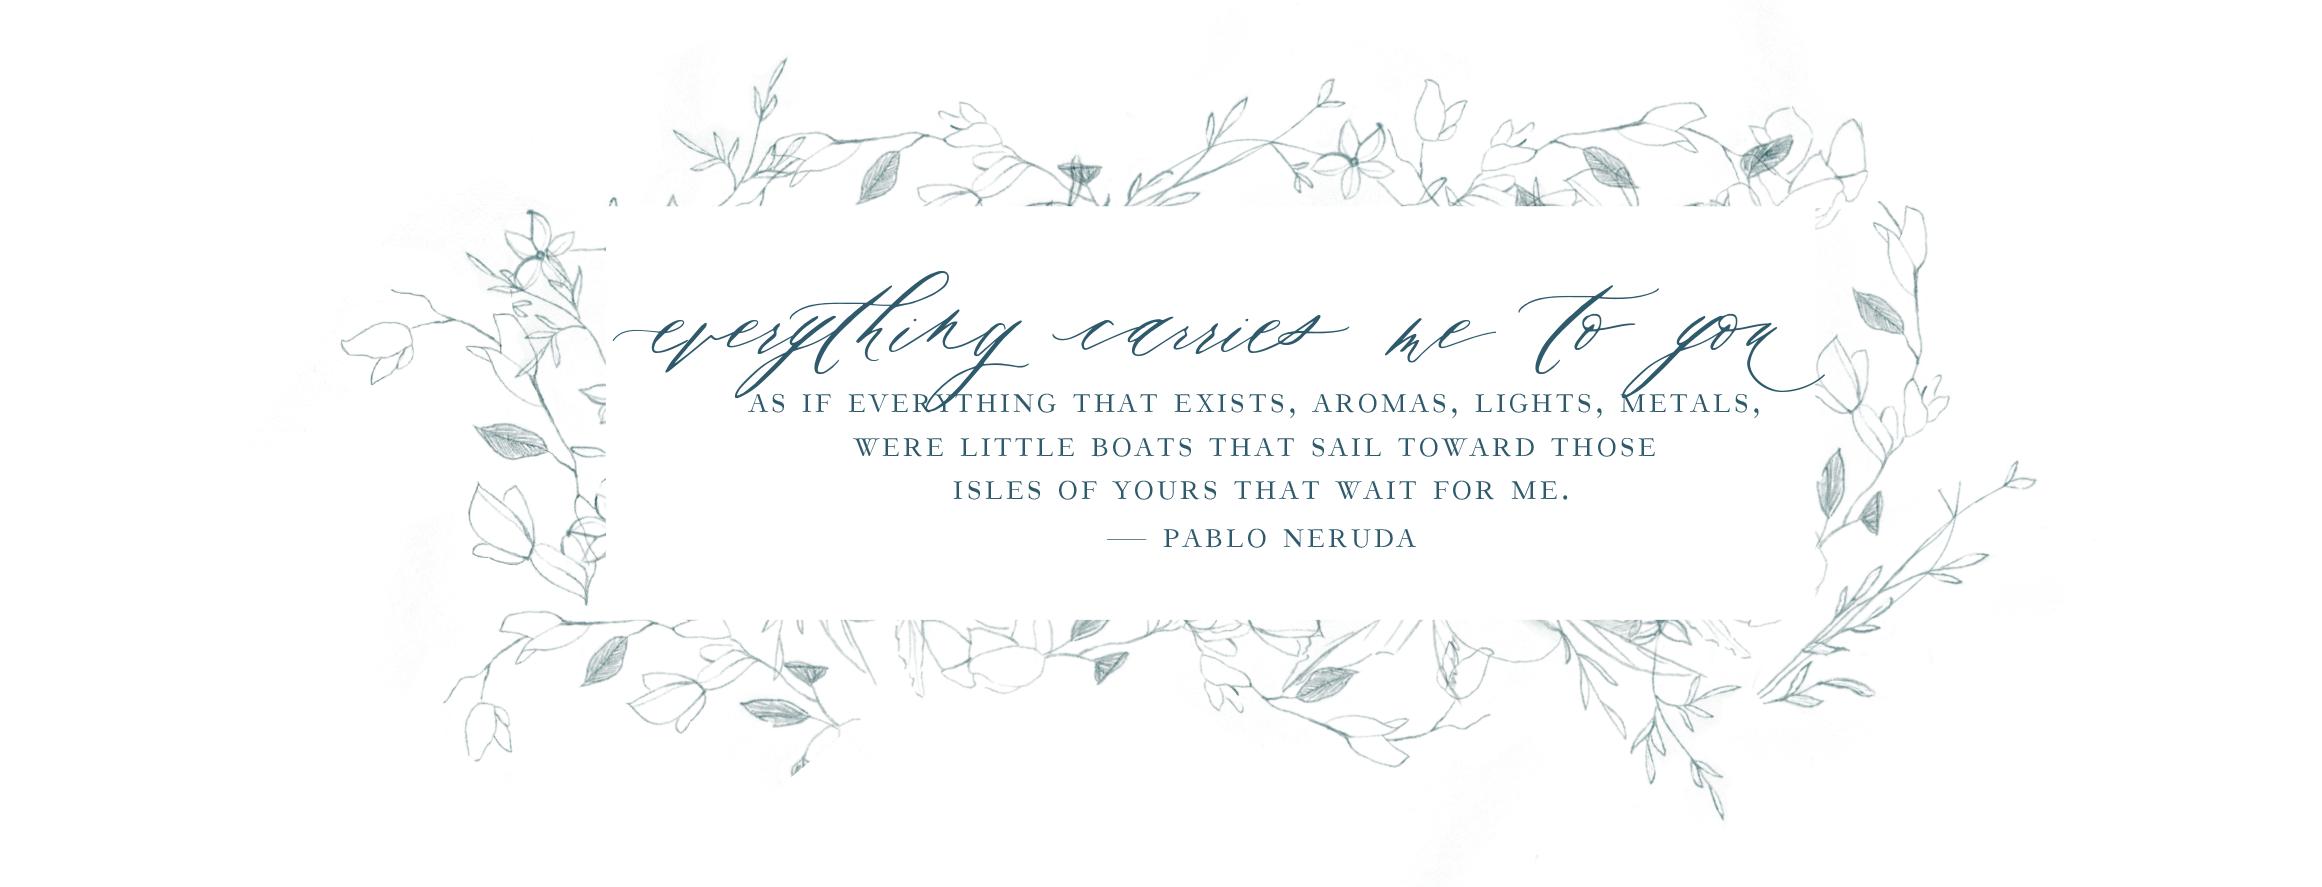 ottawa-wedding-photographer-pablo-neruda-quote.png